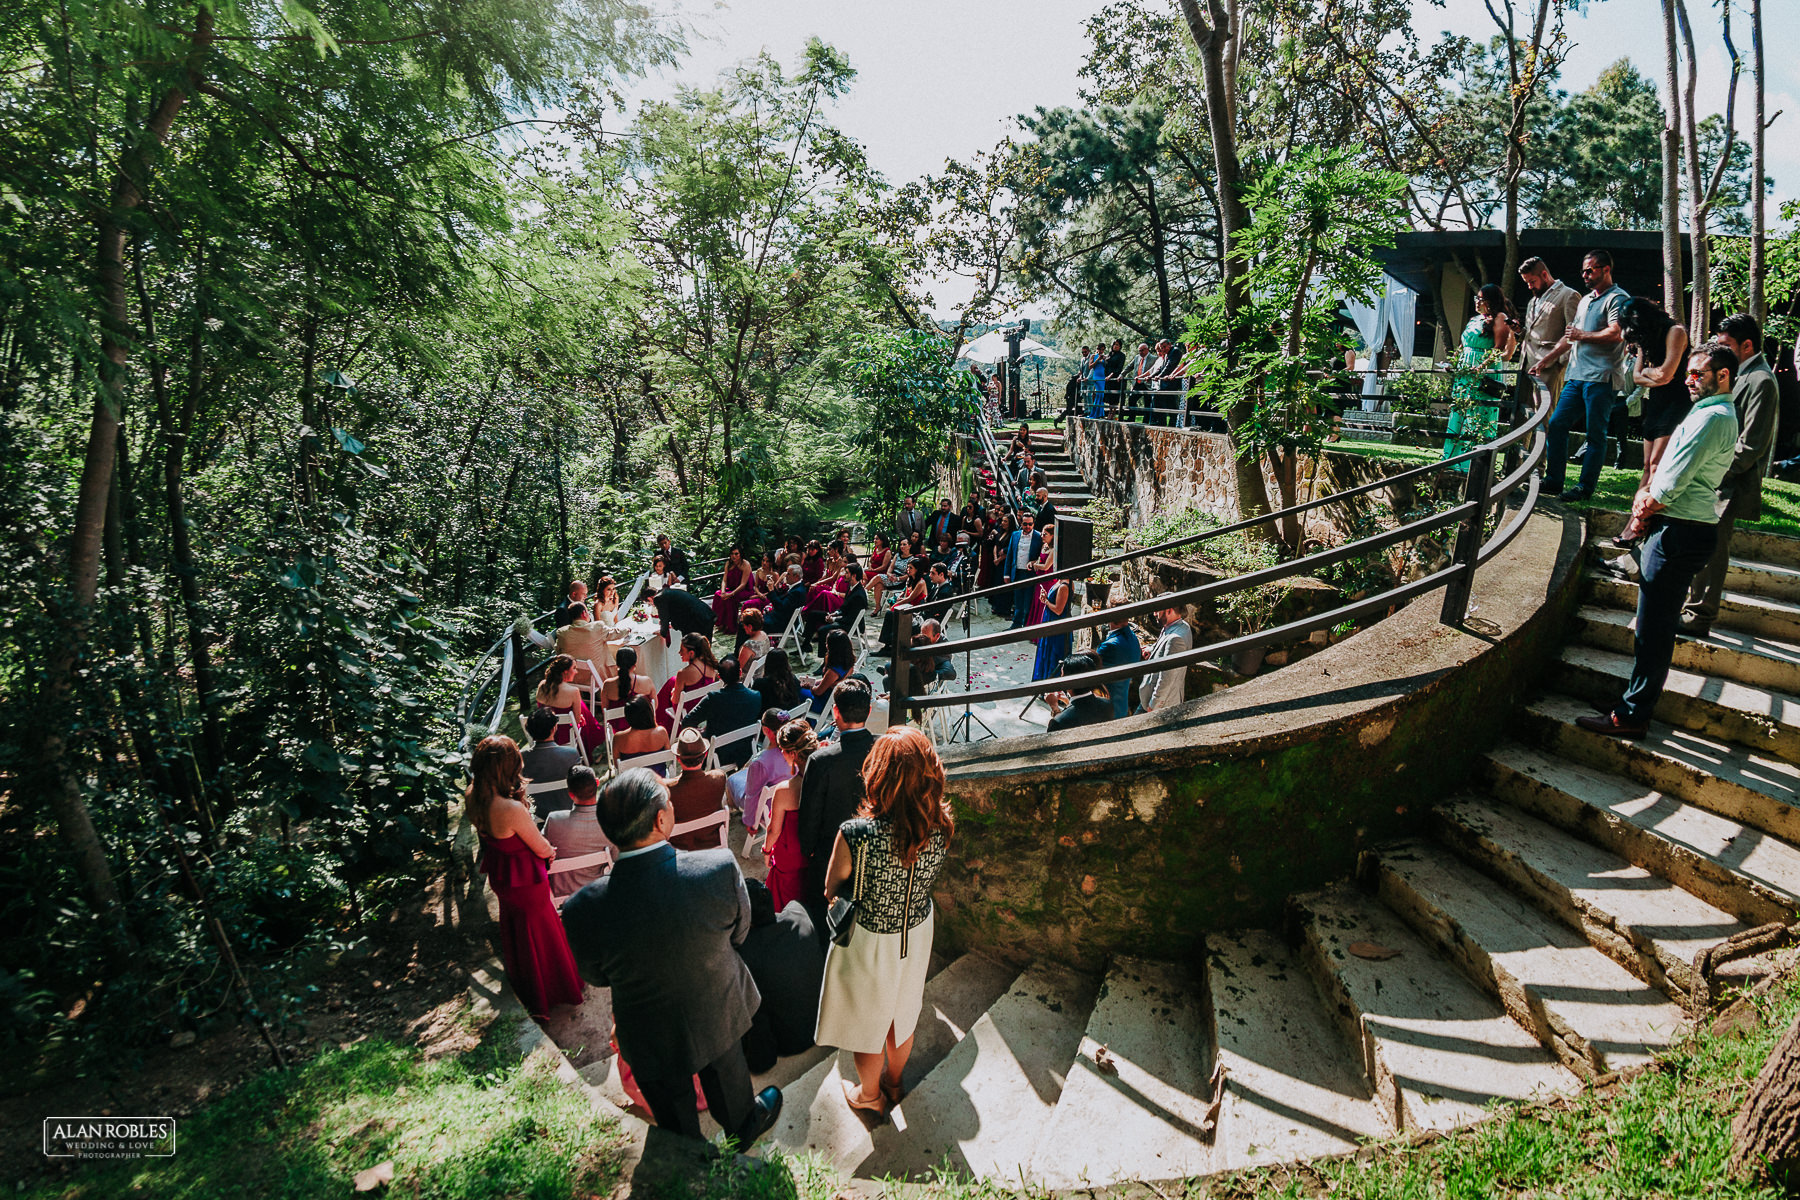 Fotografo de bodas guadalajara Alan Robles - Pinare terraza bistro 36